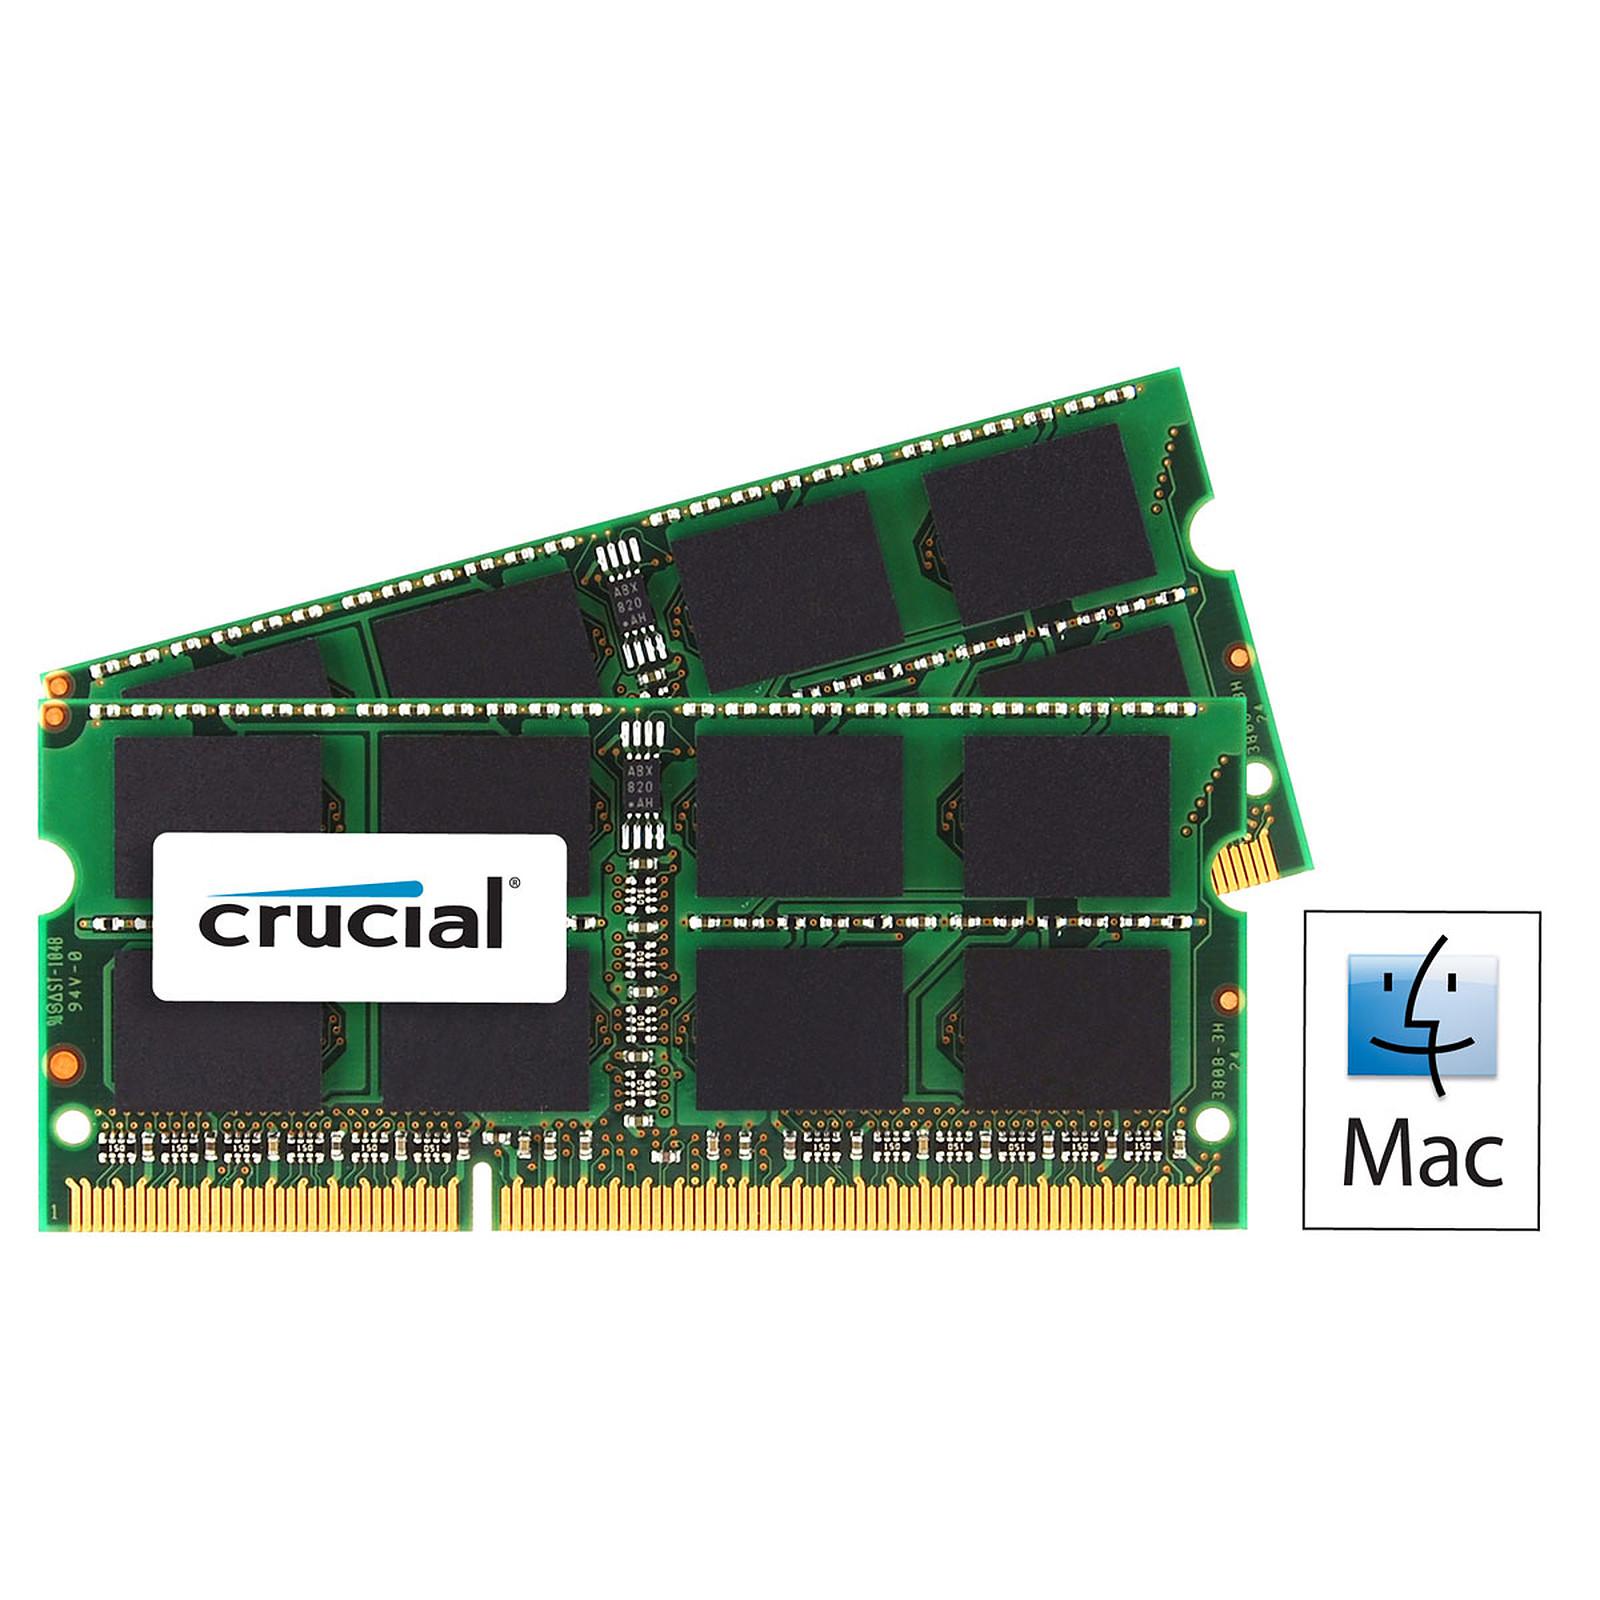 Crucial for Mac SO-DIMM 16 Go (2 x 8 Go) DDR3 1333 MHz CL9